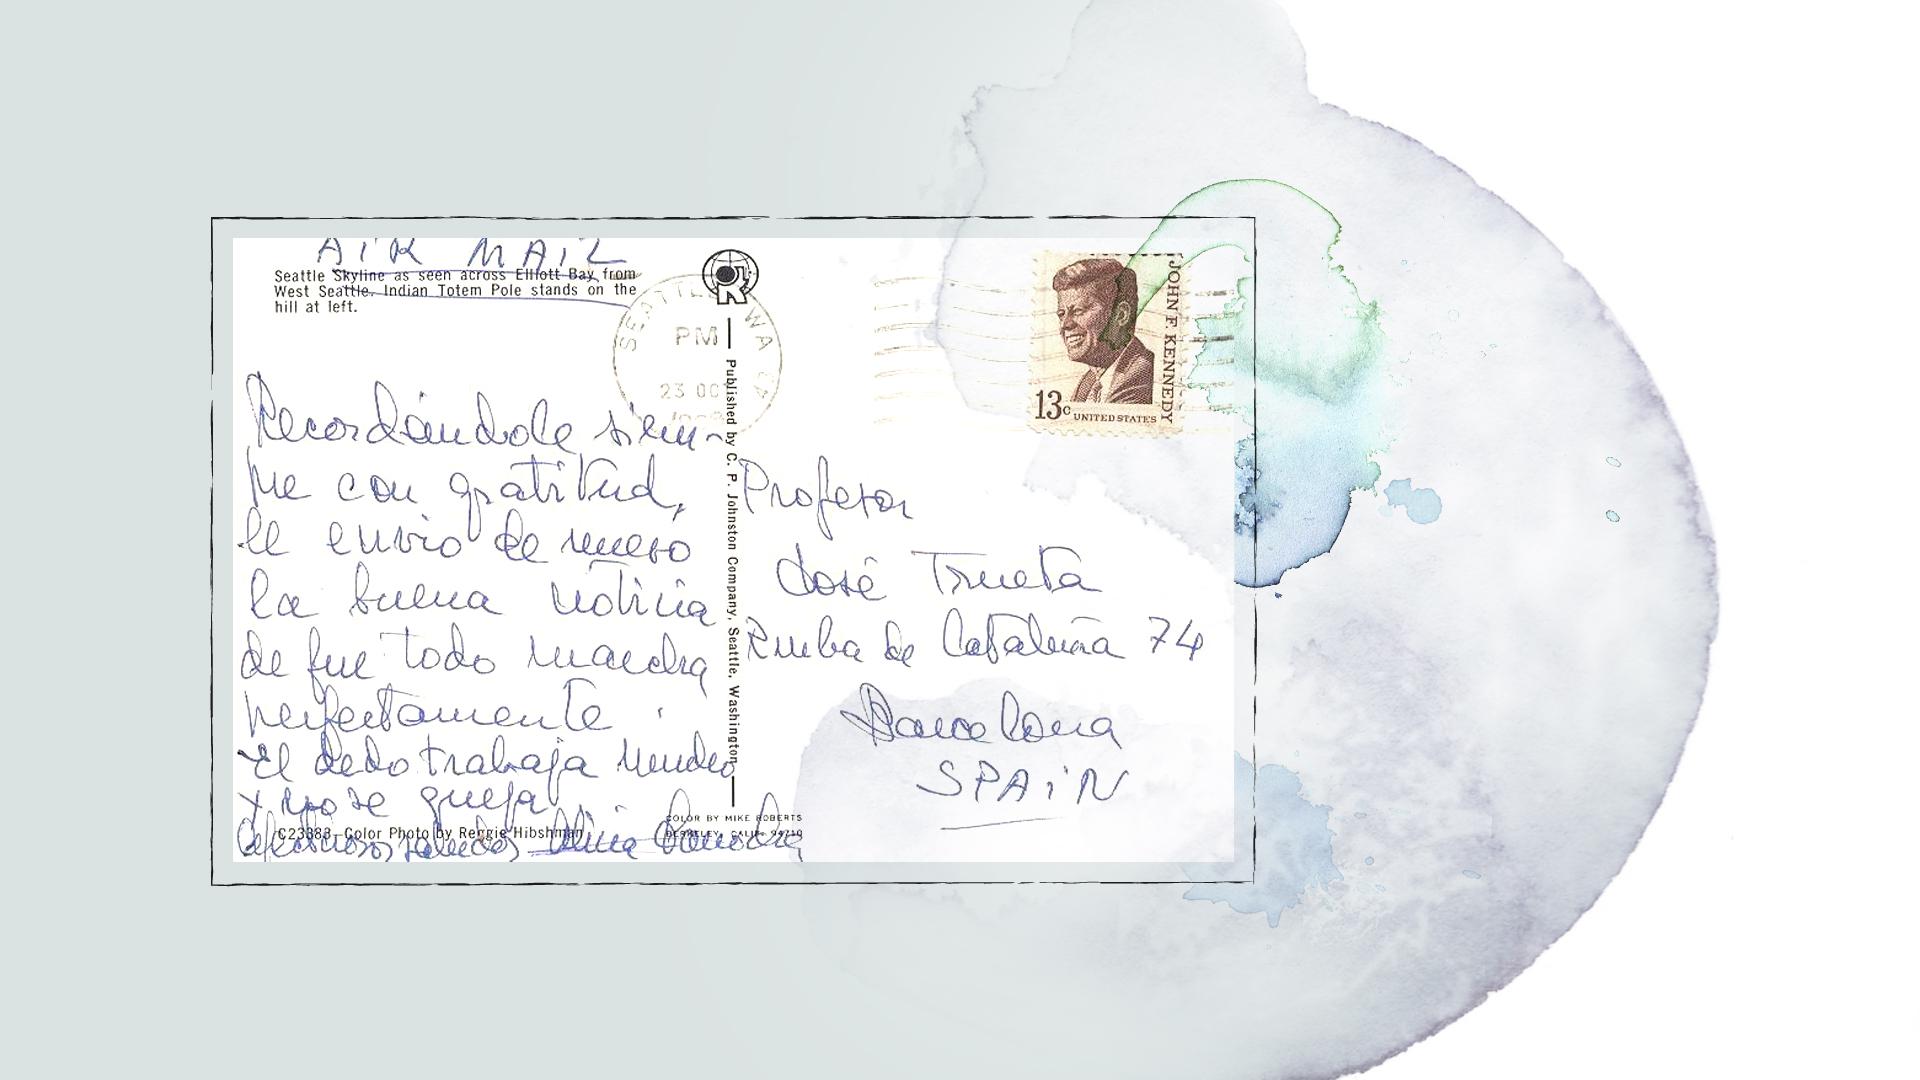 la historia de alicia de larrocha ilustrador por giselle vitali para 33recomana tv3